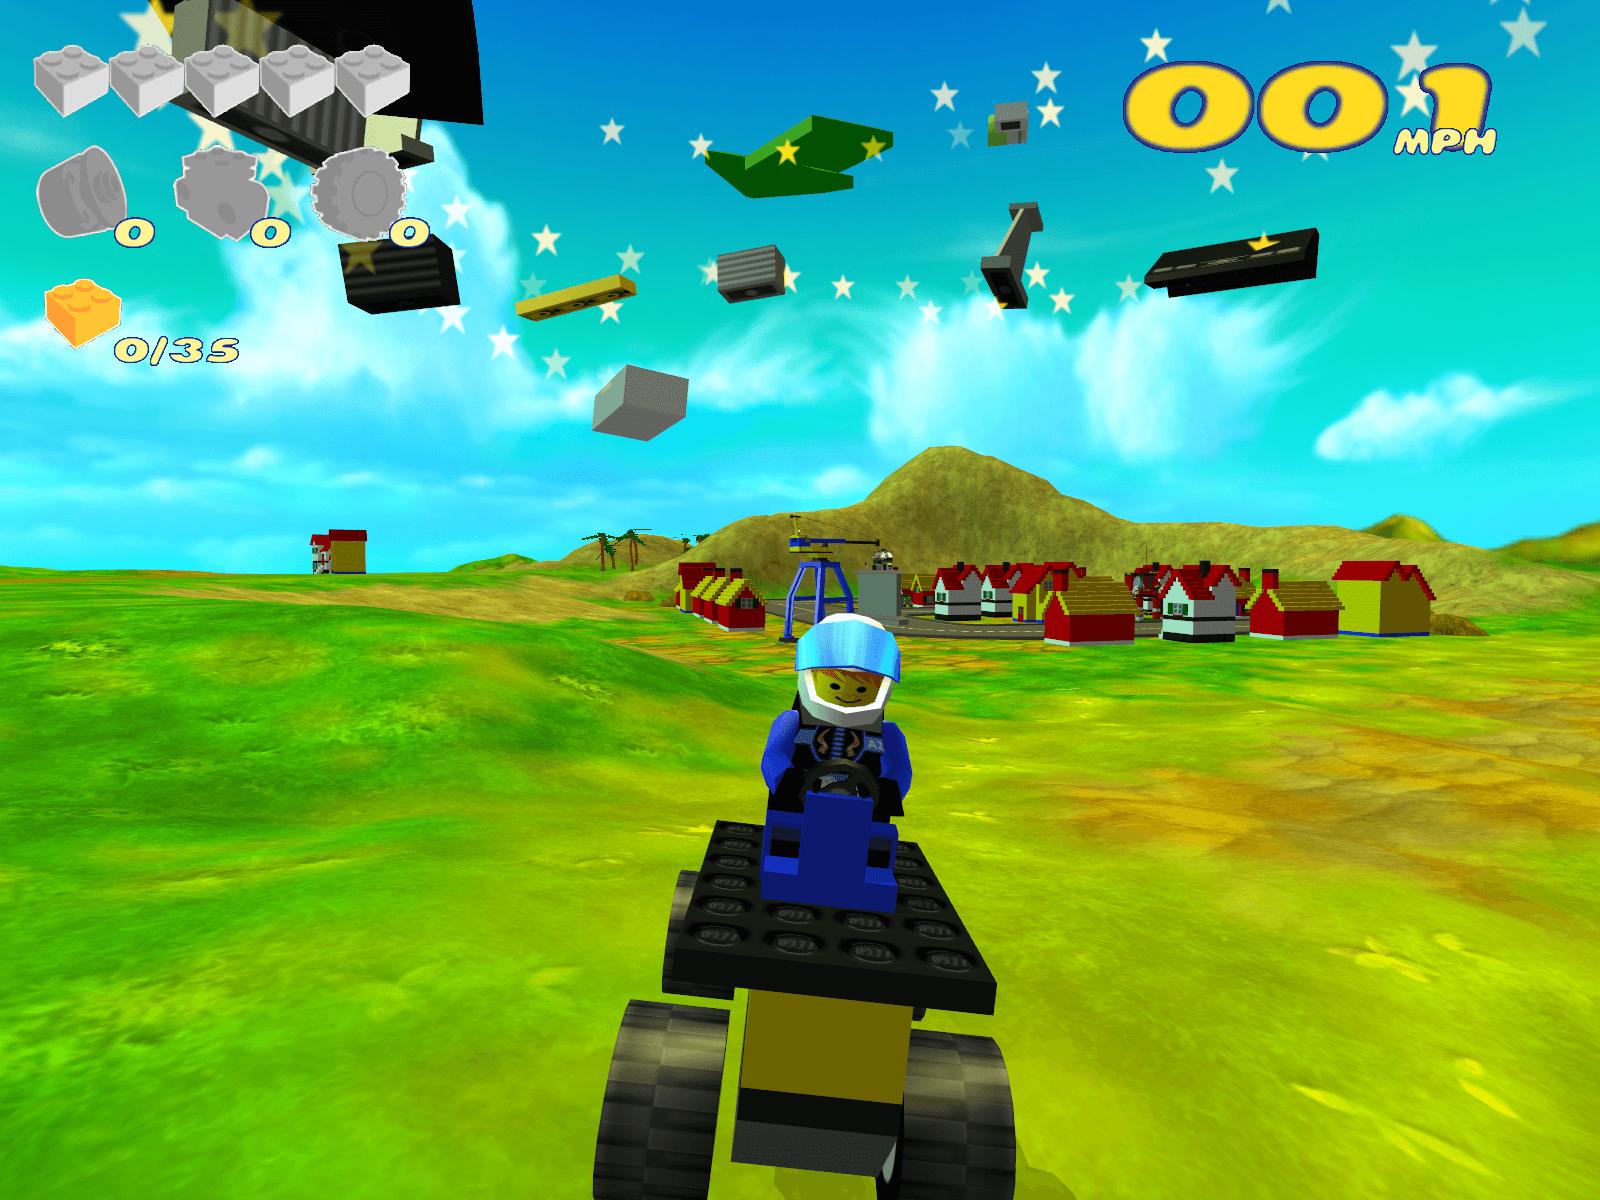 Download LEGO Racers 2 (Windows) - My Abandonware